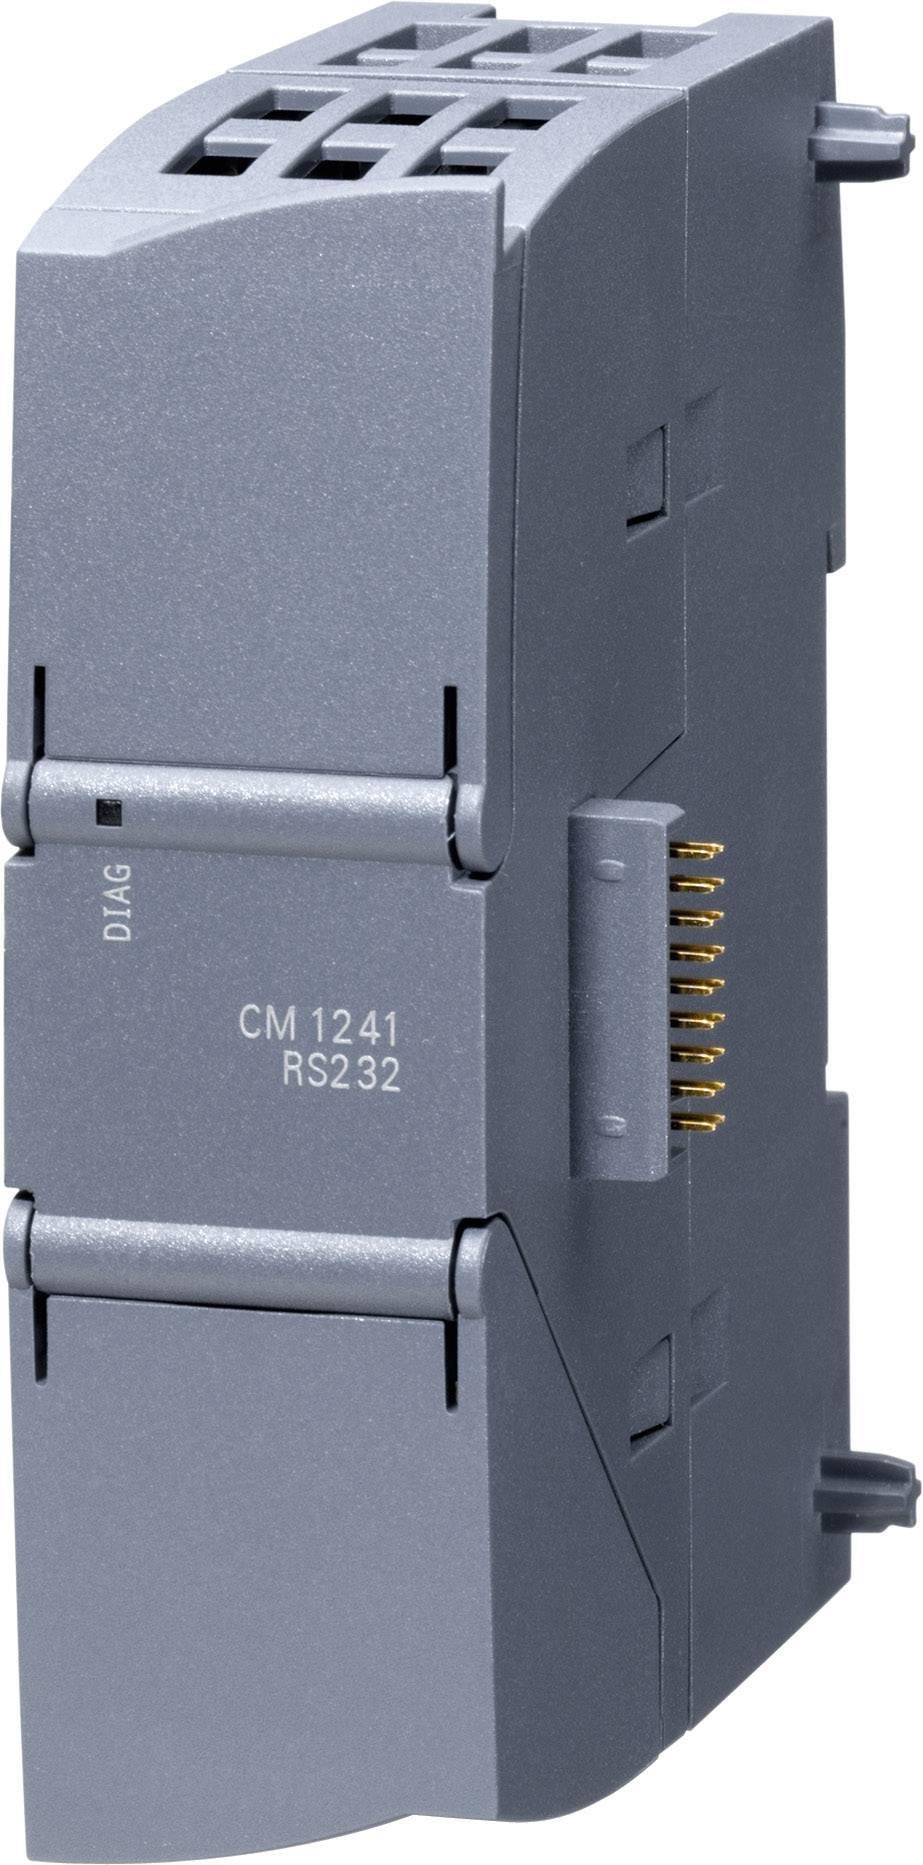 Komunikační PLC modul RS232 Siemens CM 1241 (6ES7241-1AH32-0XB0)